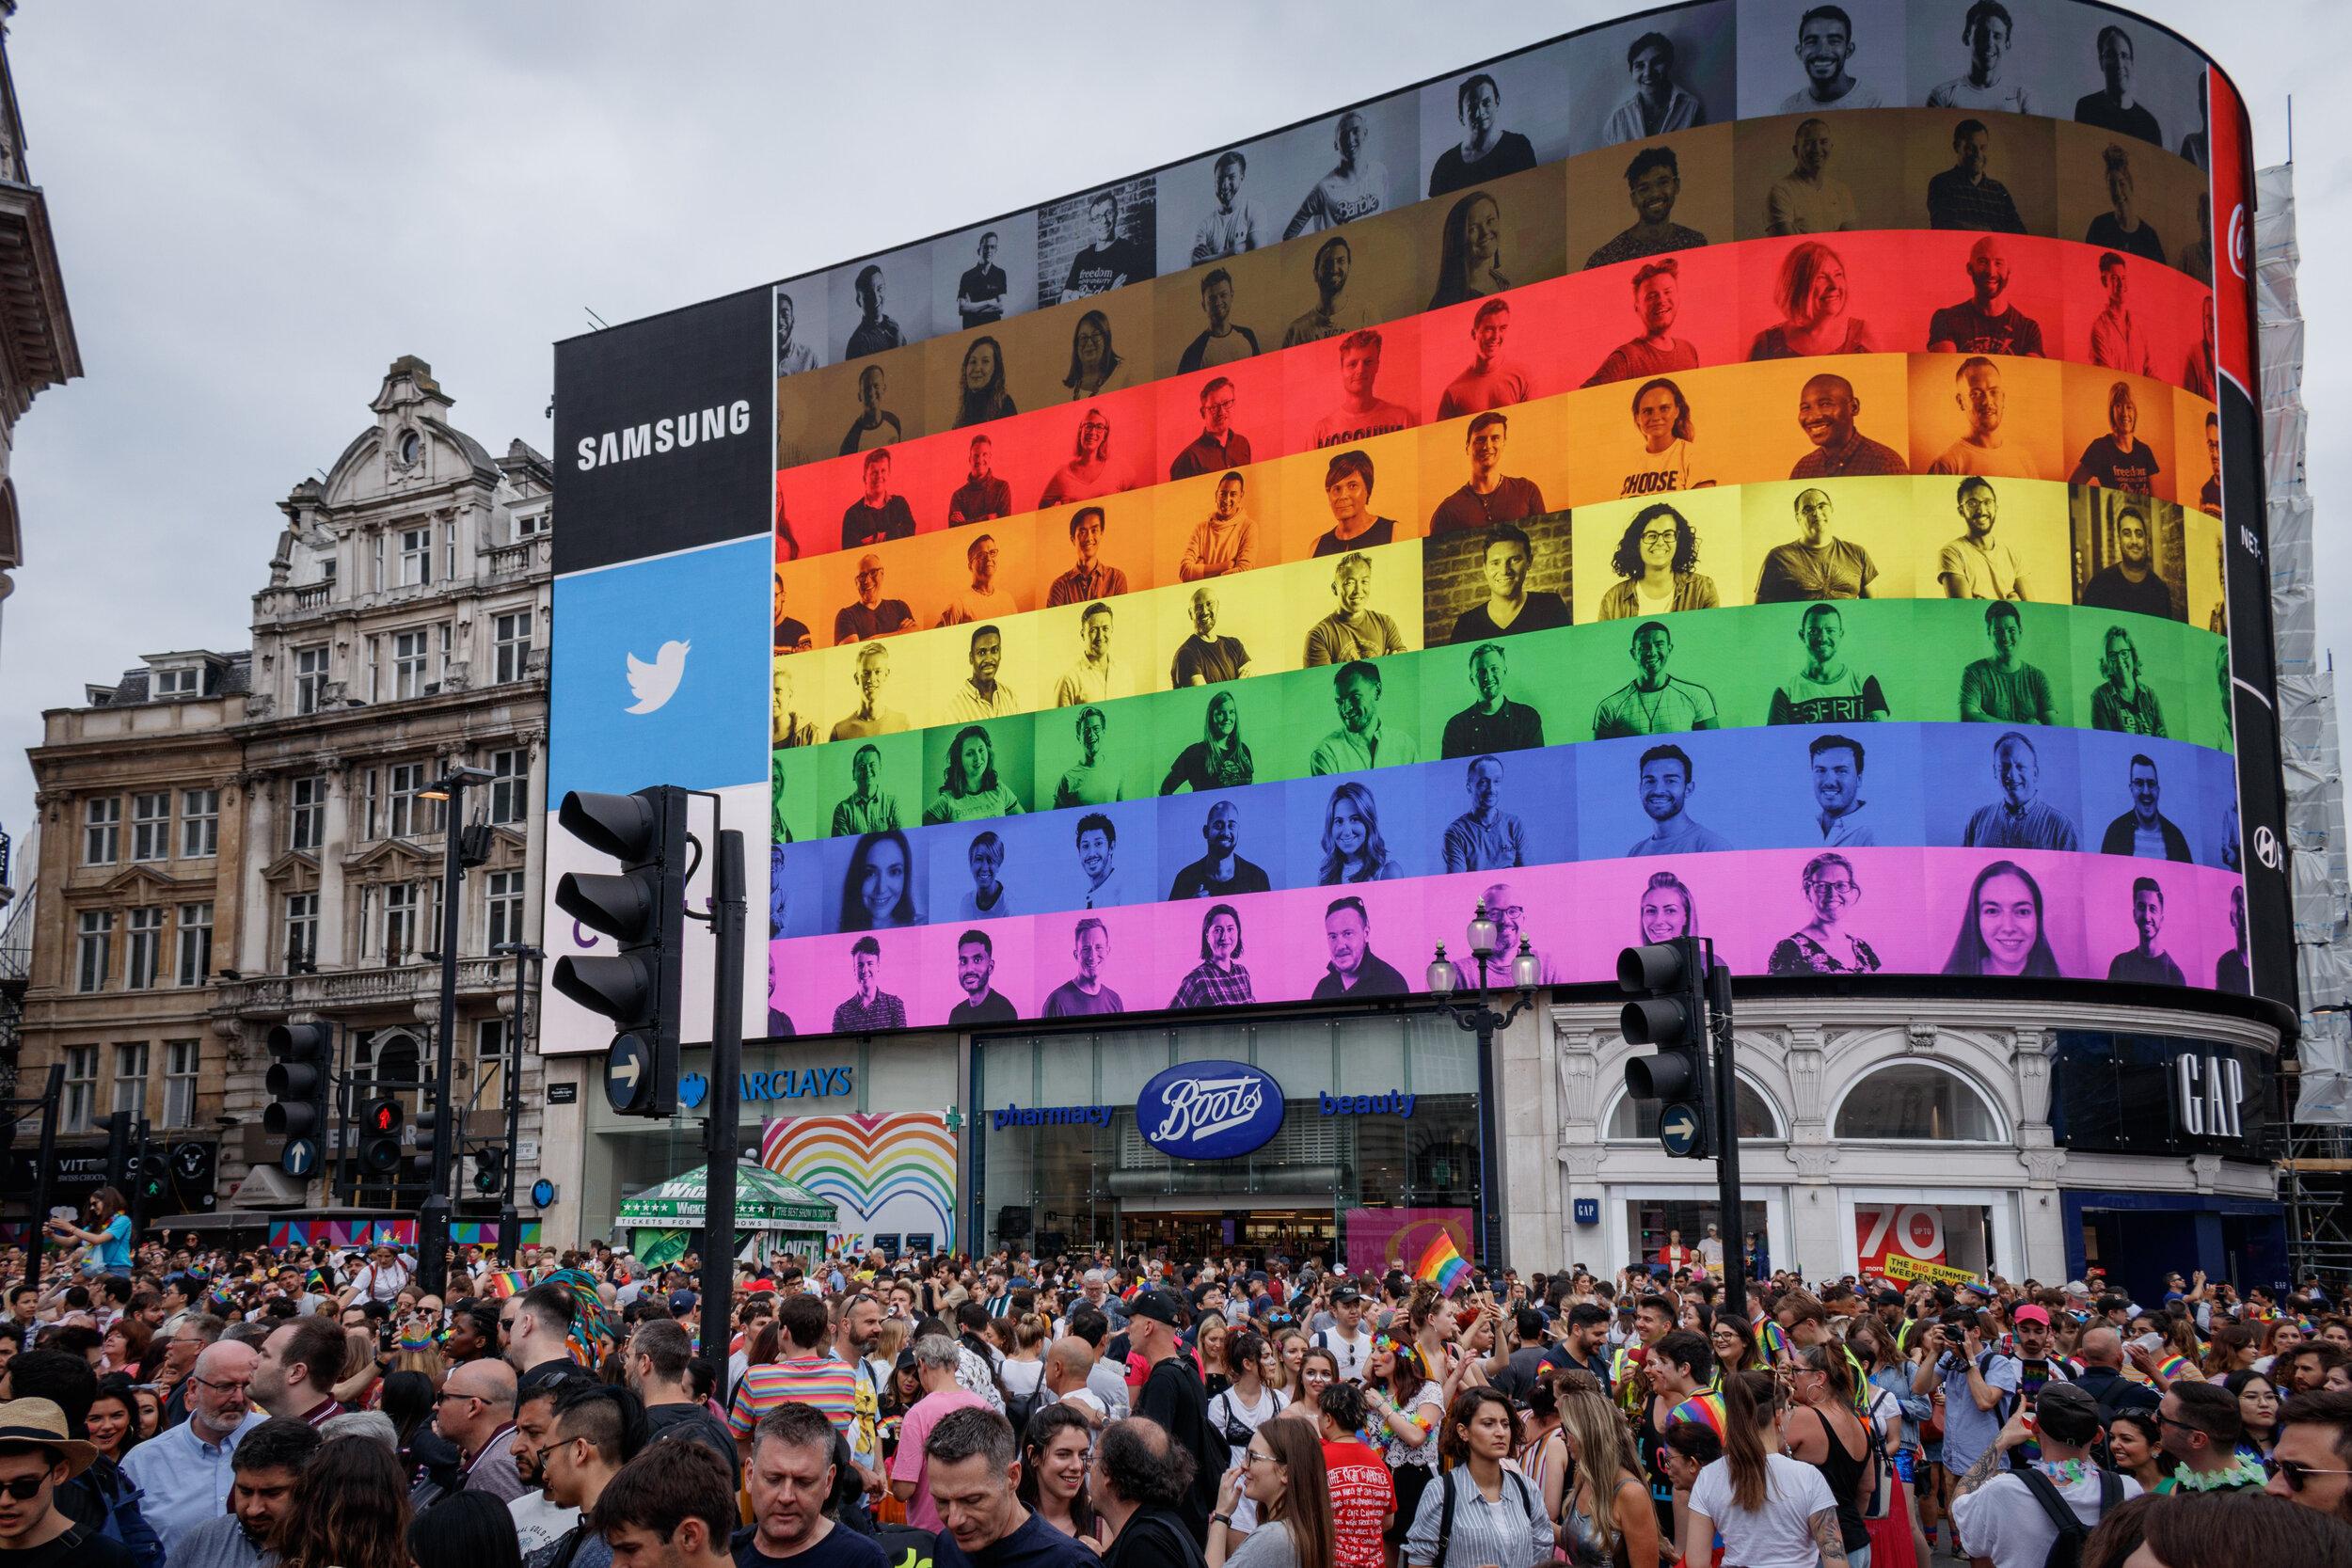 London Pride Parade Belinda Jiao.jpg